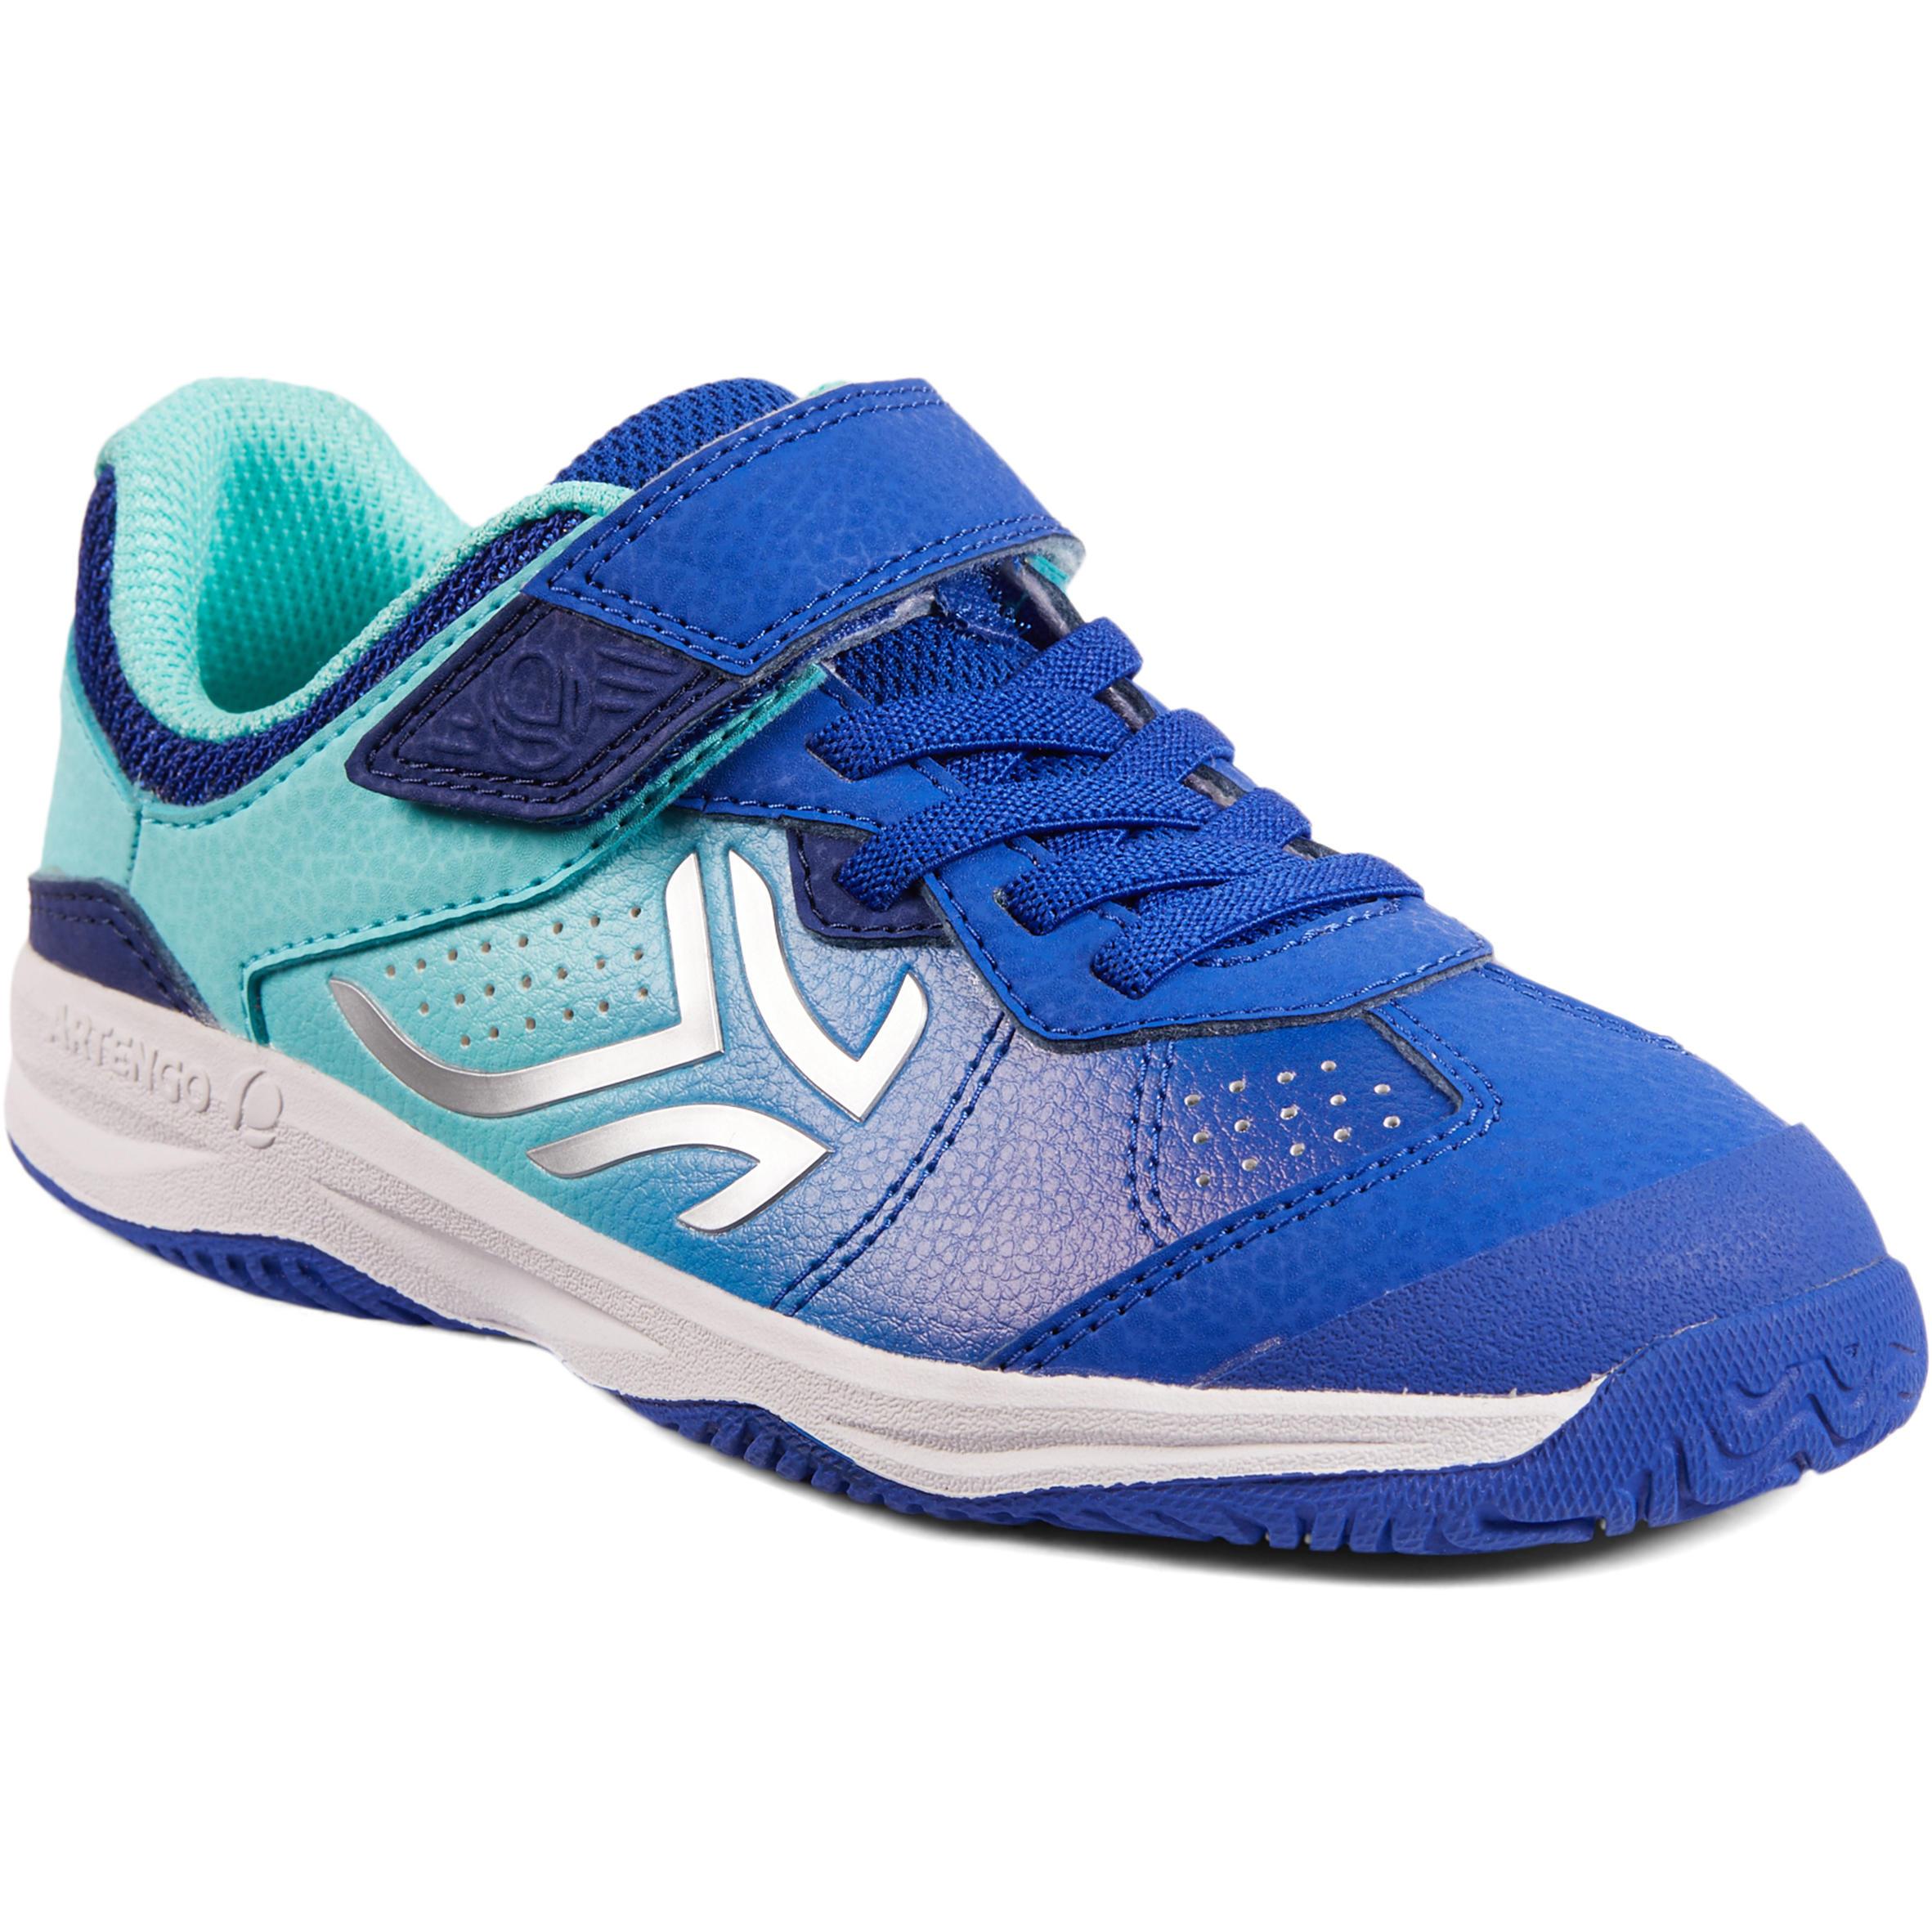 Chaussures enfant tennis artengo ts160 din artengo